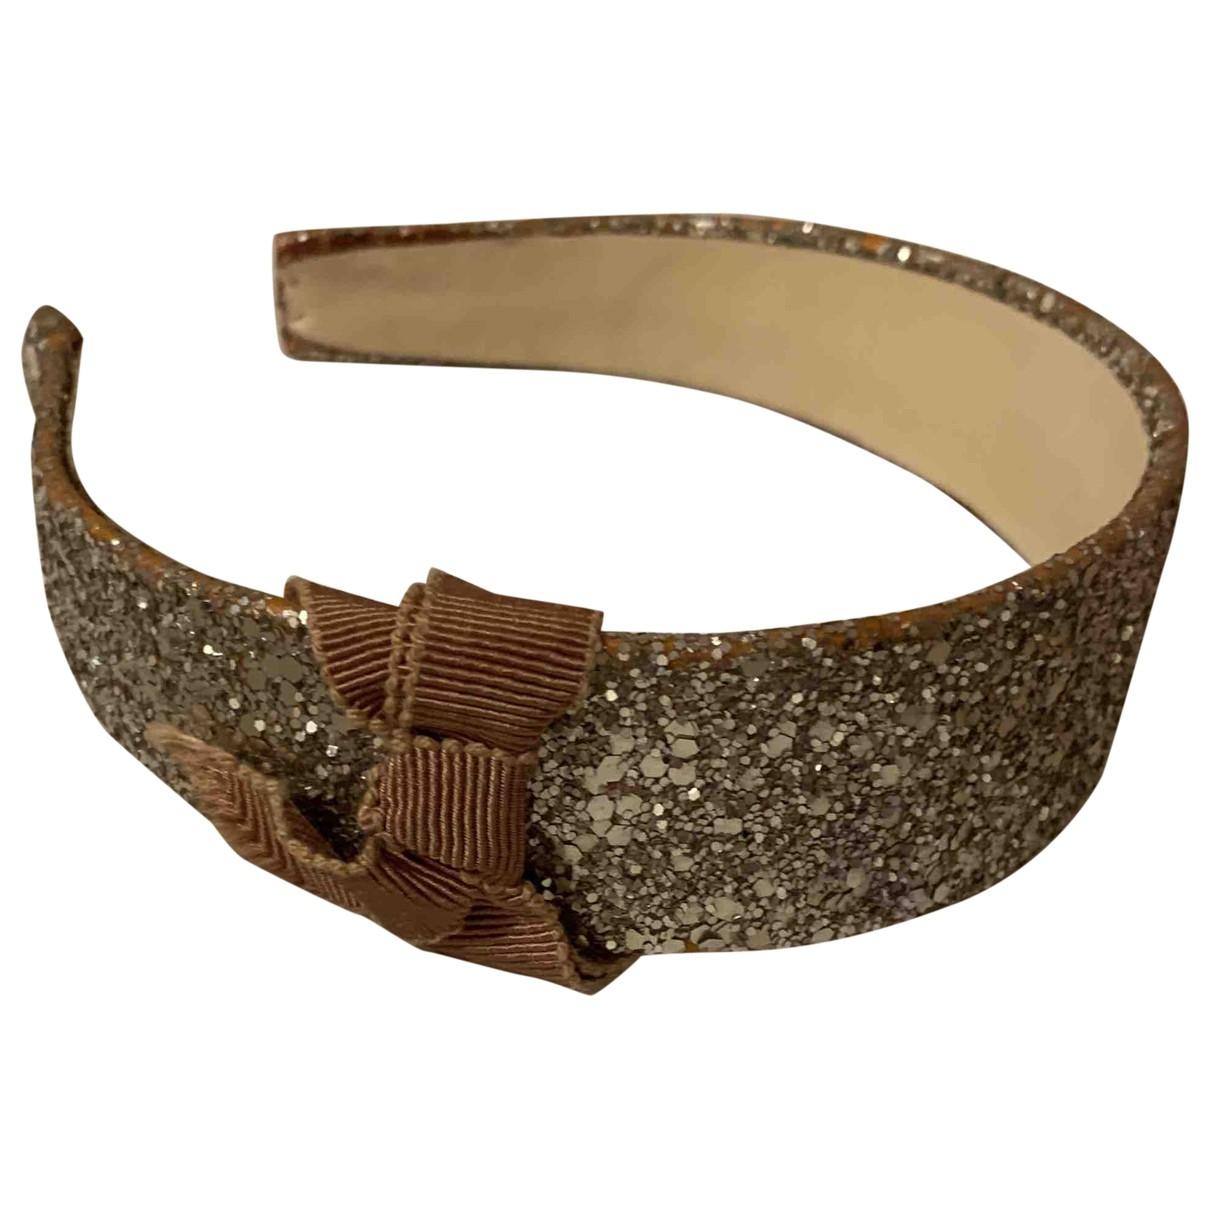 Miu Miu \N Gold Cloth Hair accessories for Women XS International